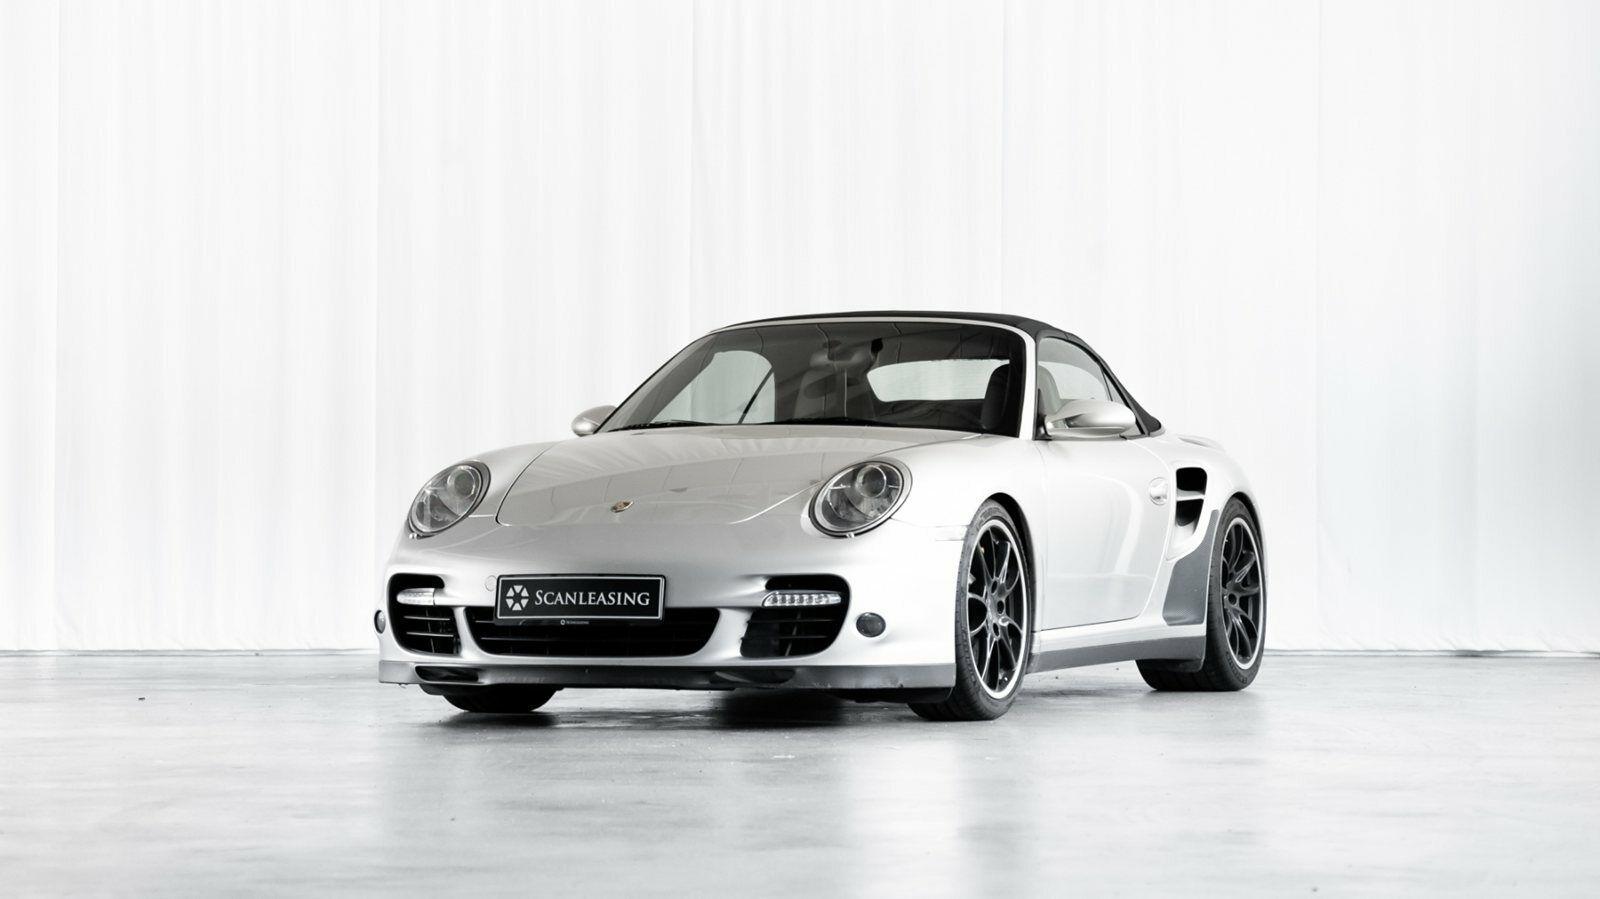 Porsche 911 Turbo 3,6 Cabriolet 2d - 3.996 kr.